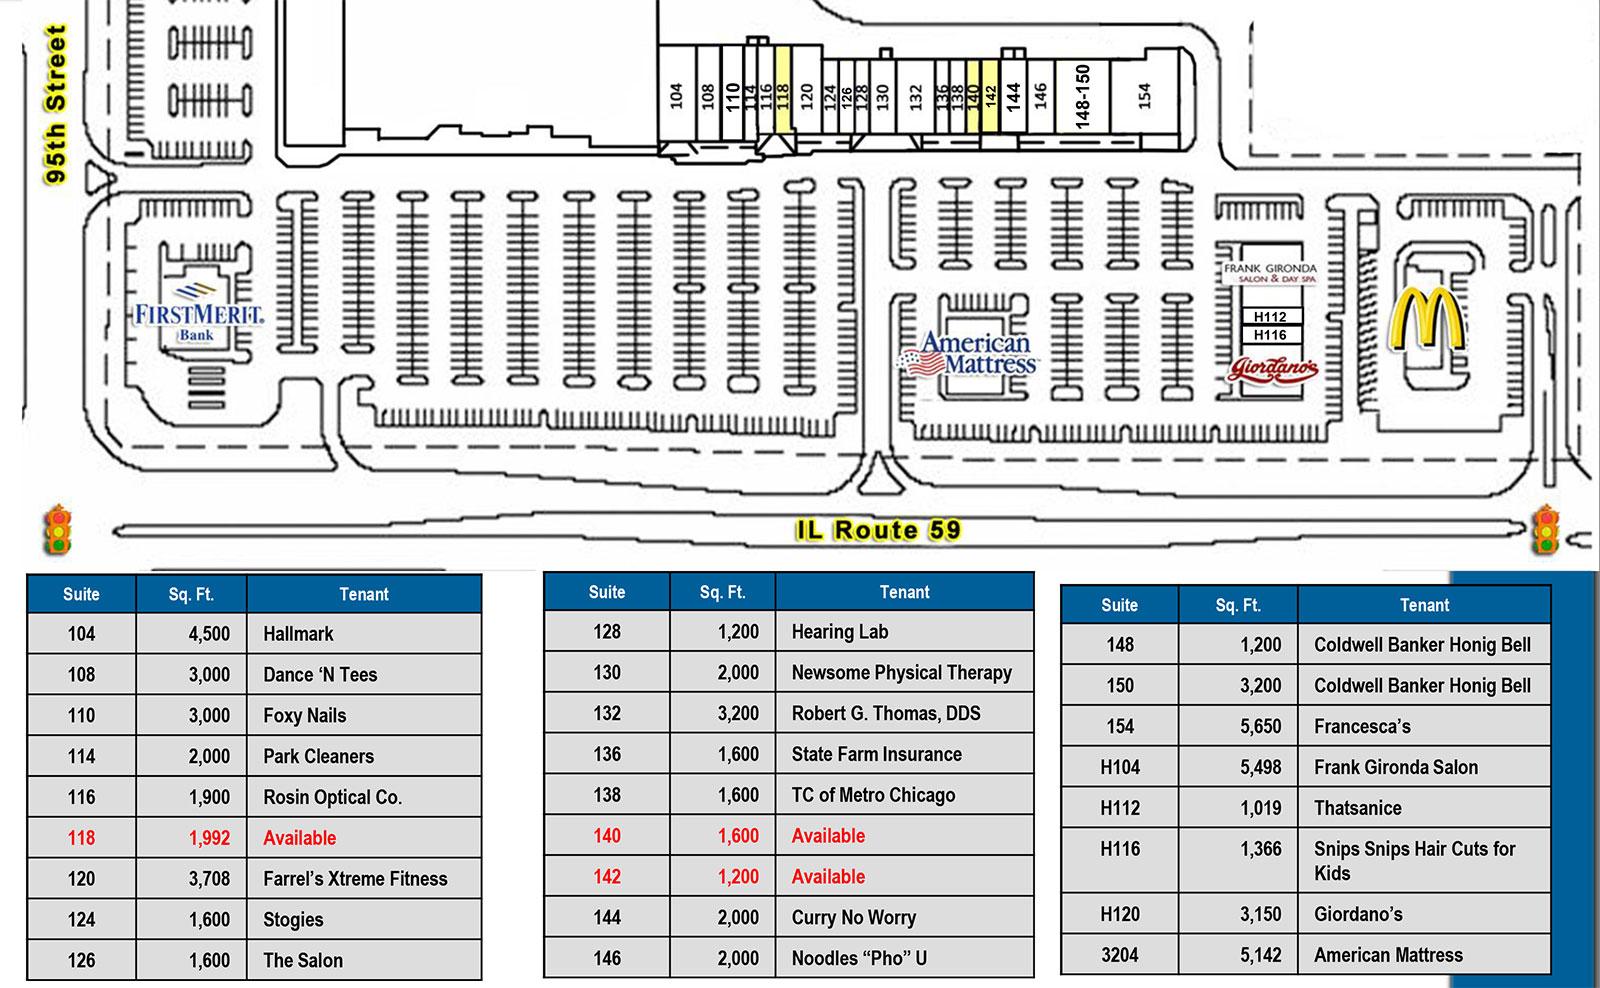 Wheatland Marketplace site plan